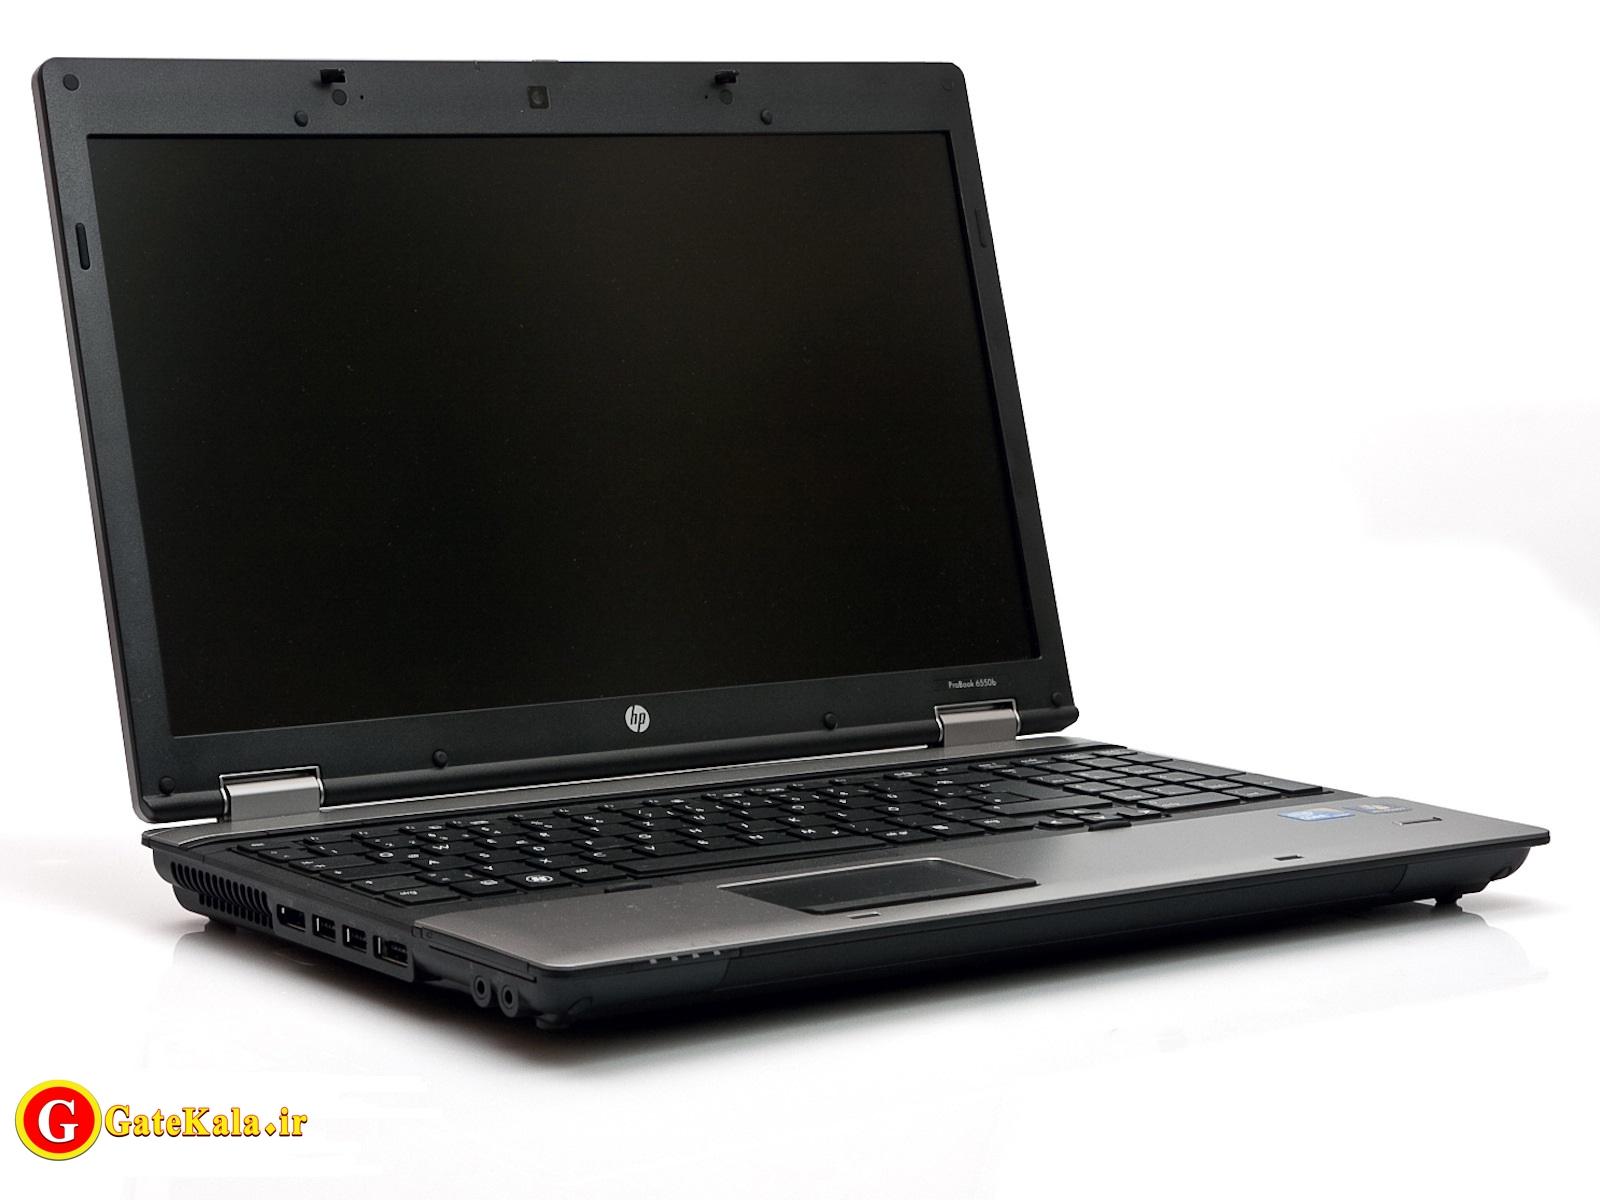 لپ تاپ استوک HP ProBook 6545b